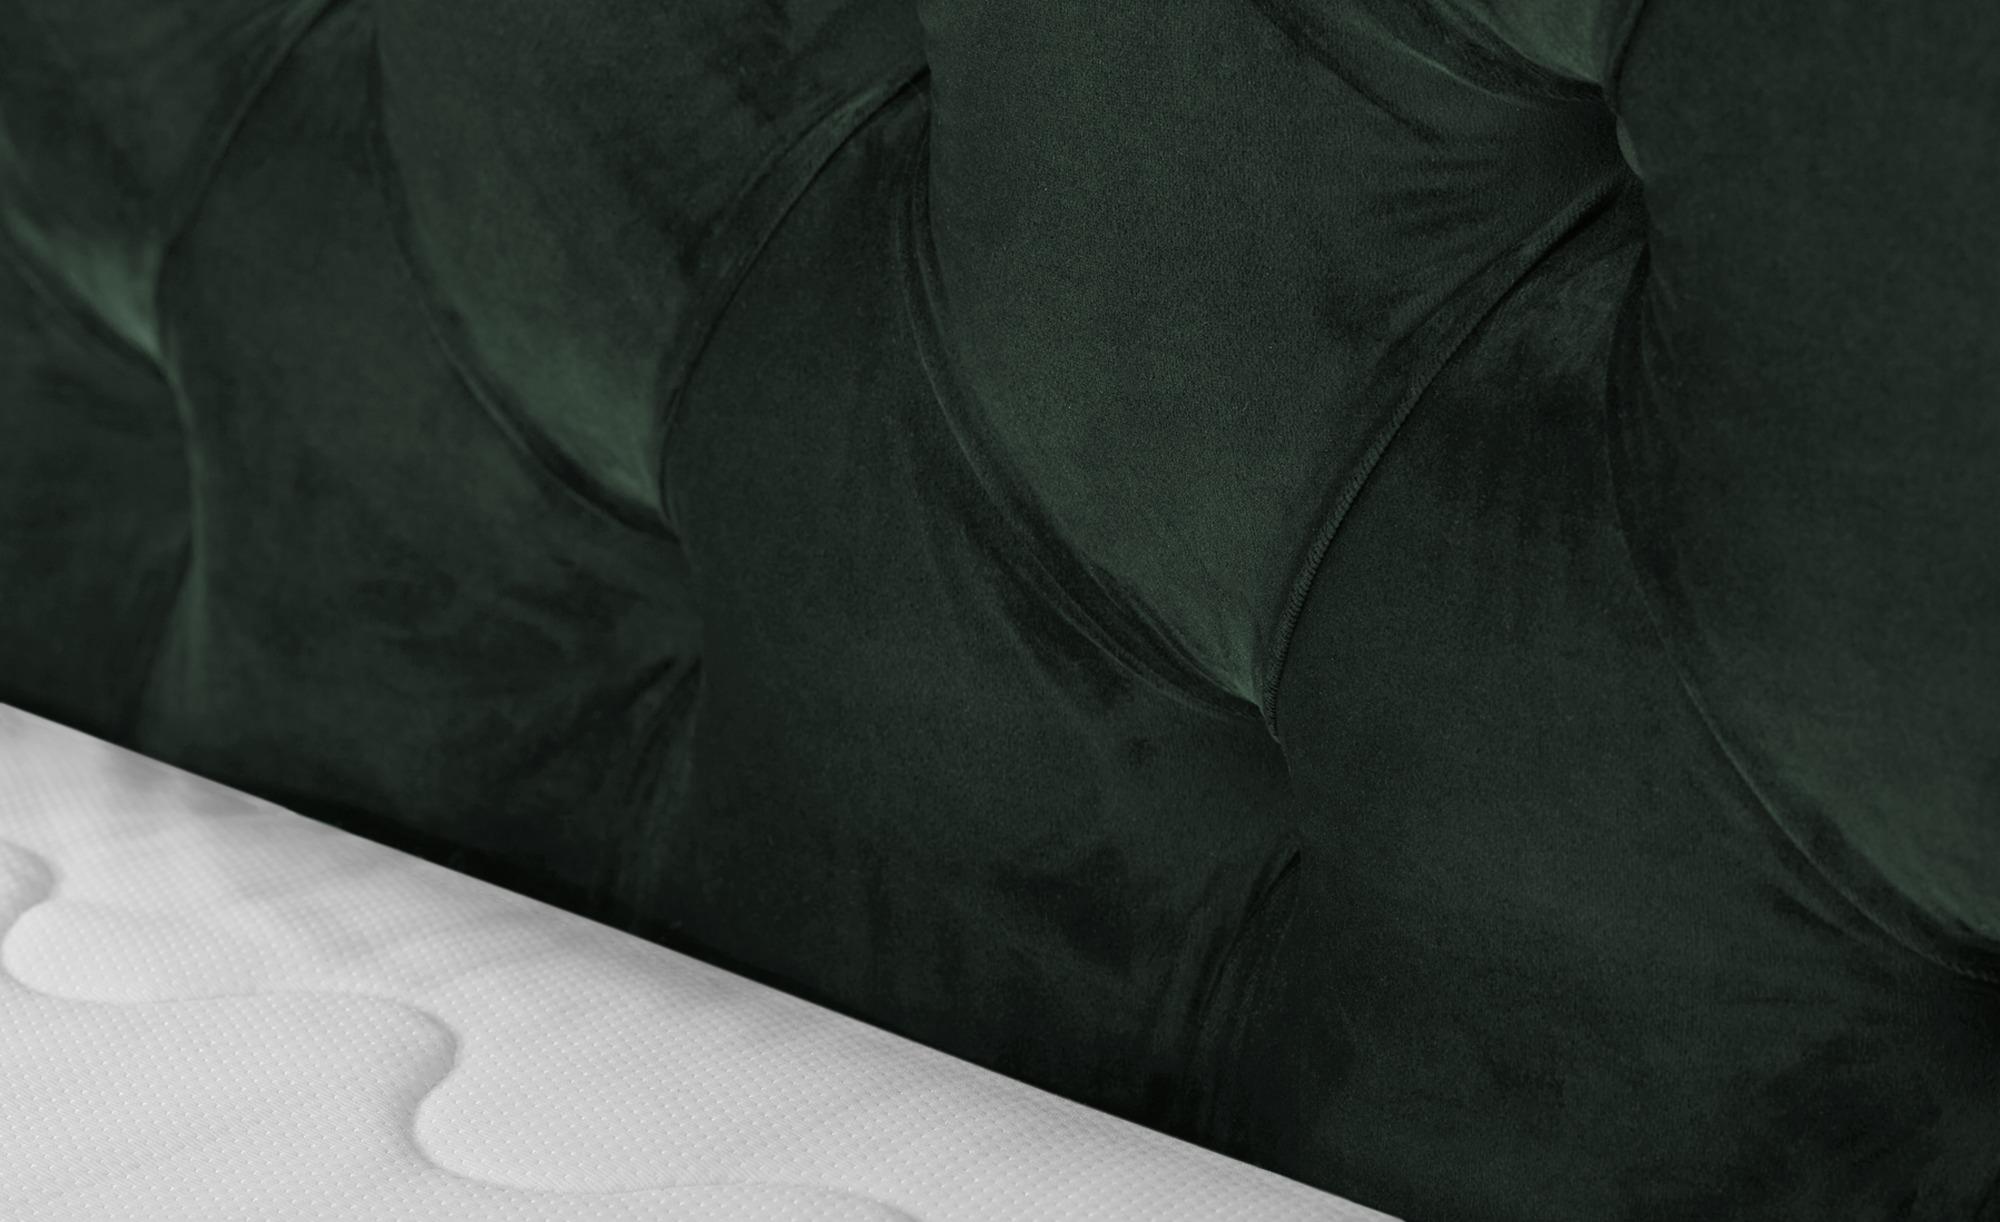 SKAGEN BEDS Boxspringbett  Laesa ¦ grün ¦ Maße (cm): B: 215 H: 122 Betten > Boxspringbetten > Boxspringbetten 140x200 - Höffner